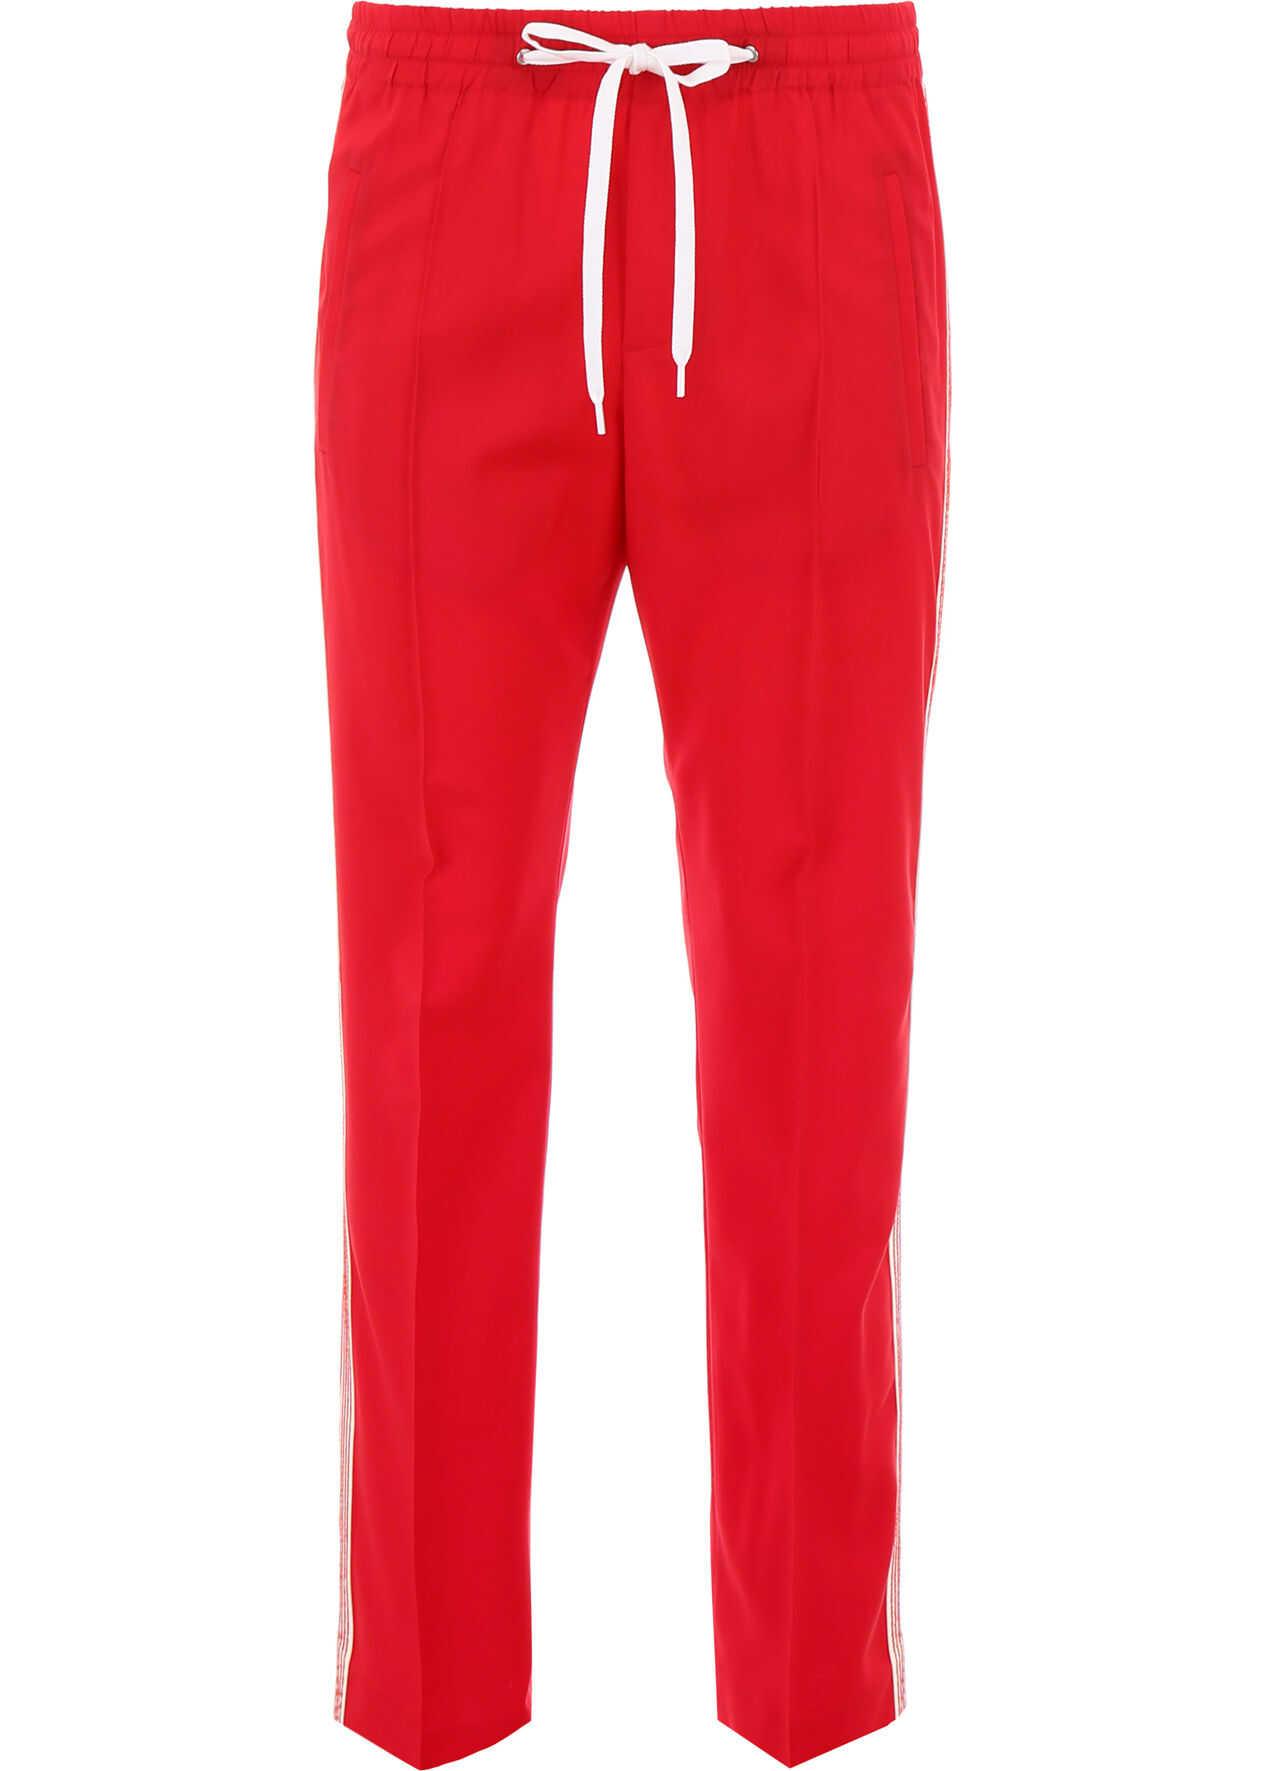 Miu Miu Sporty Underground Trousers ROSSO